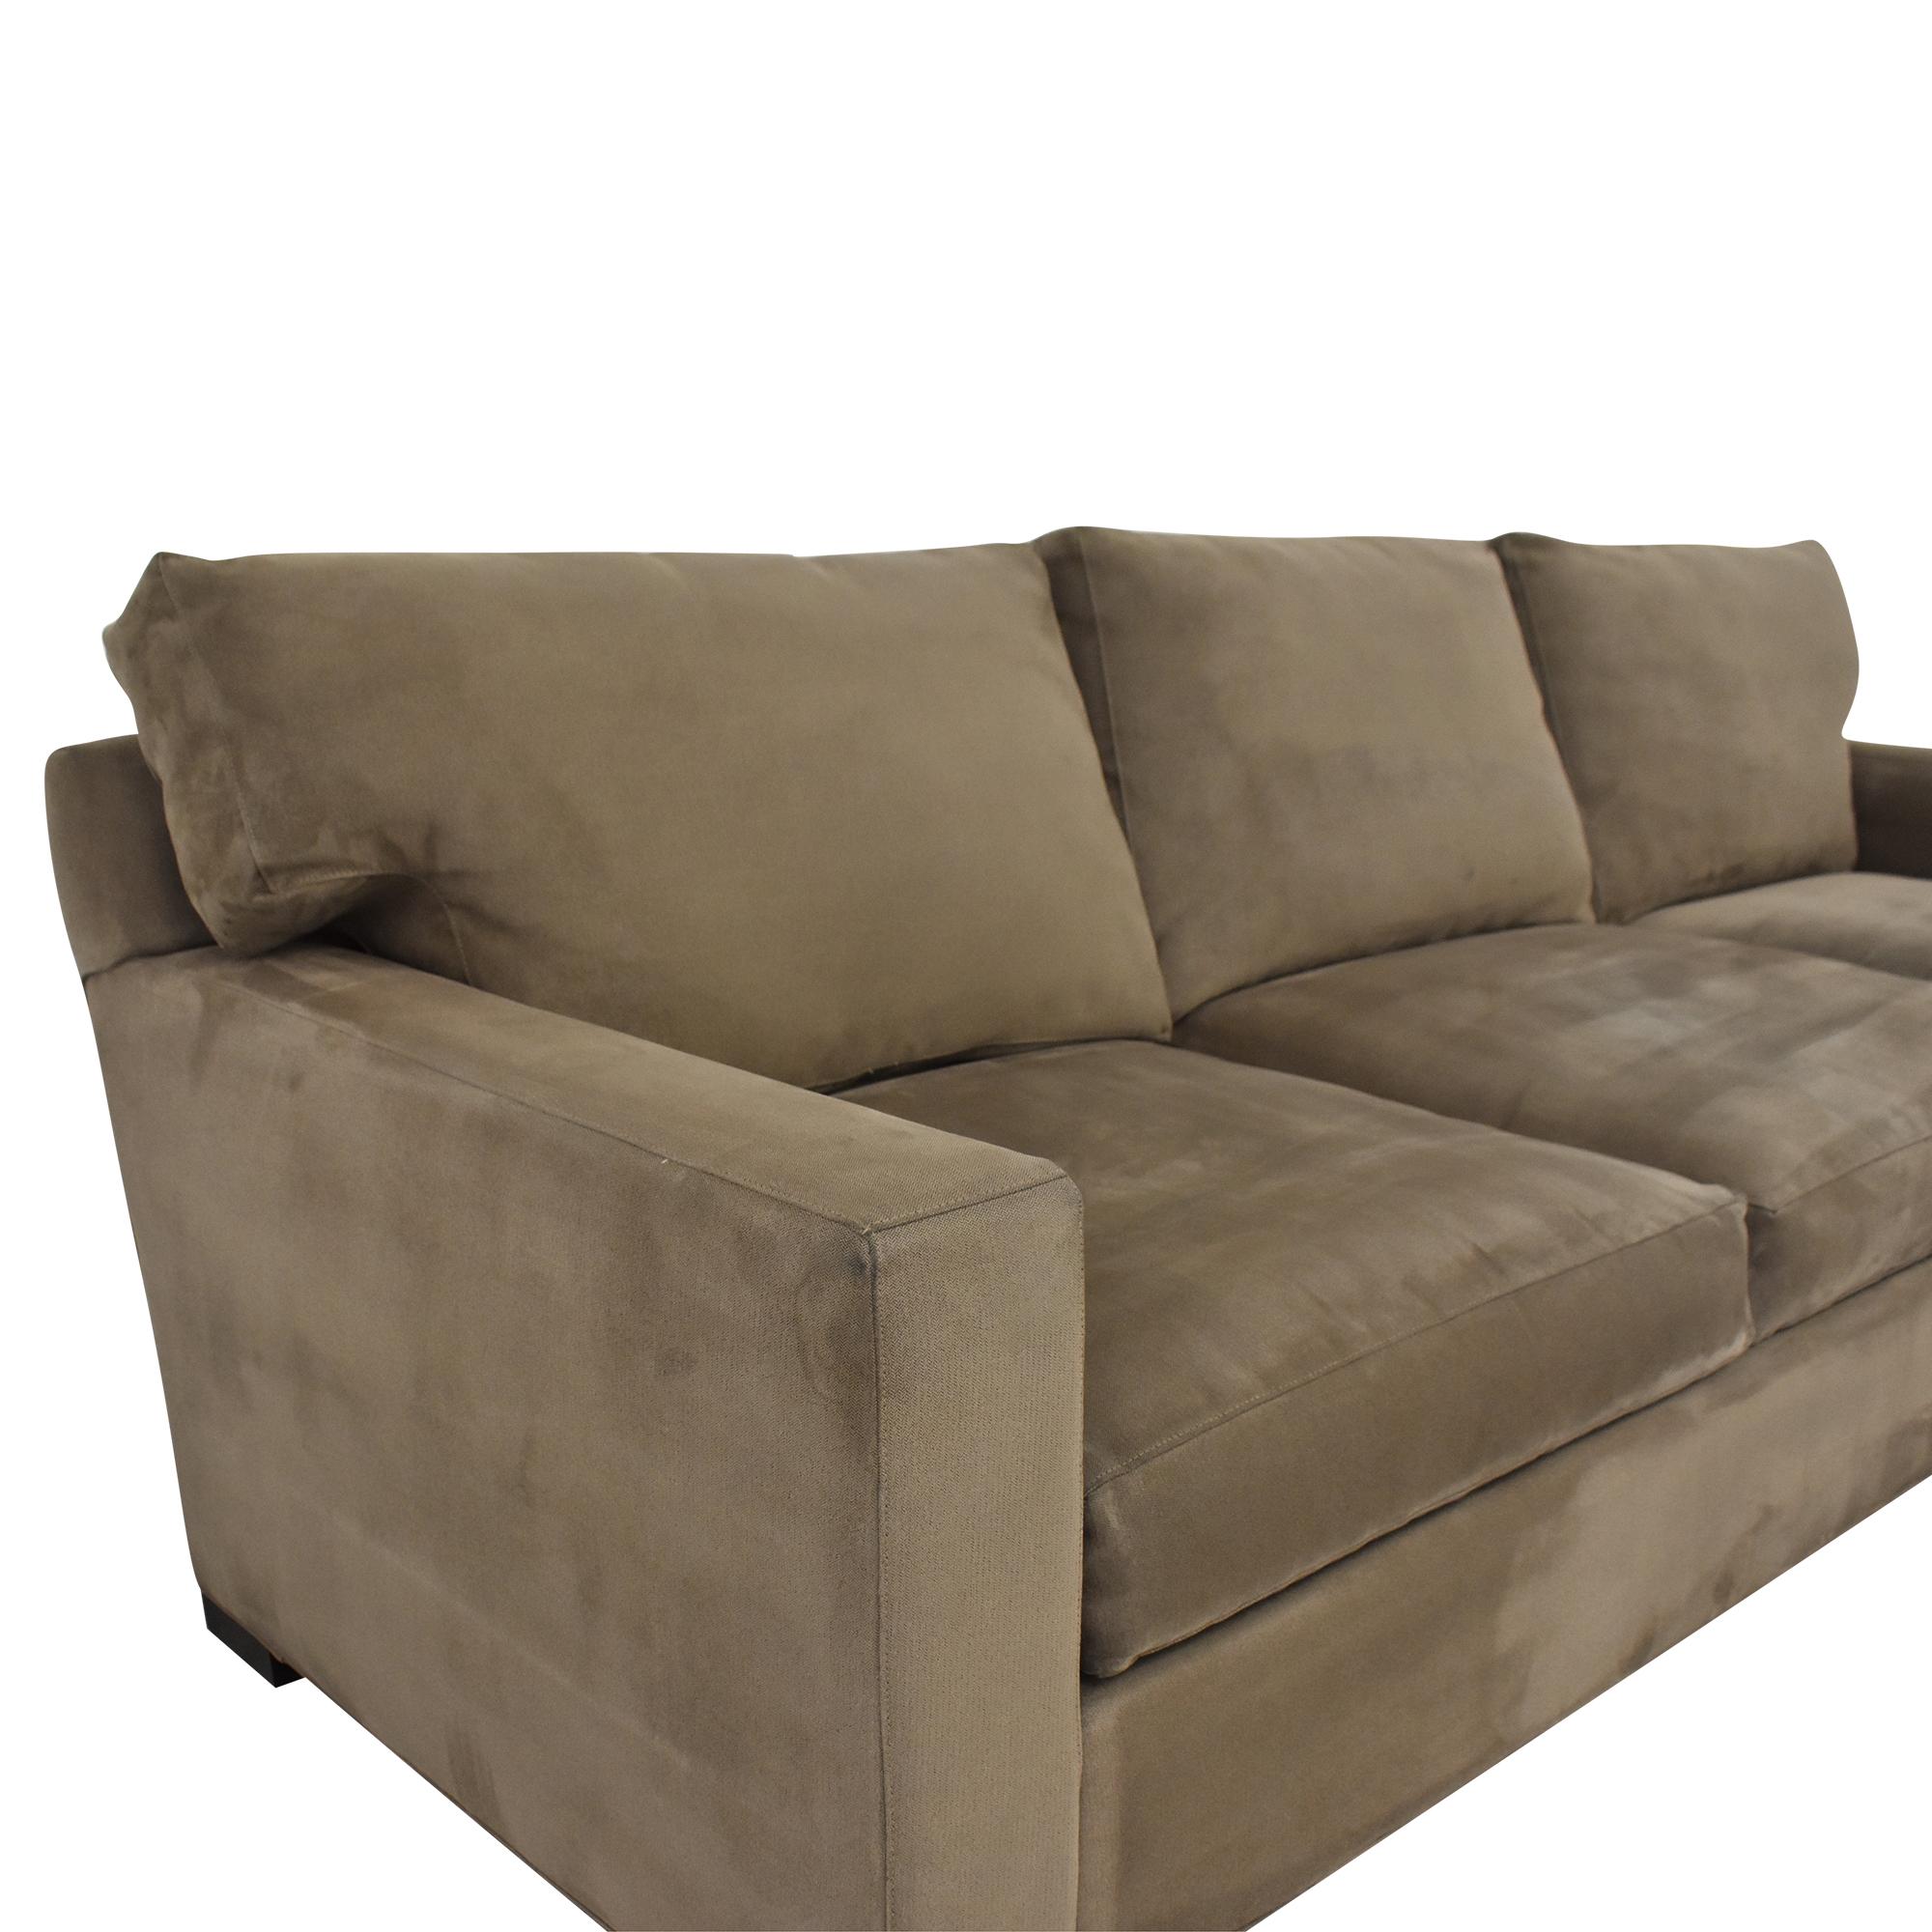 Crate & Barrel Crate & Barrel Axis Sectional Sofa Sectionals